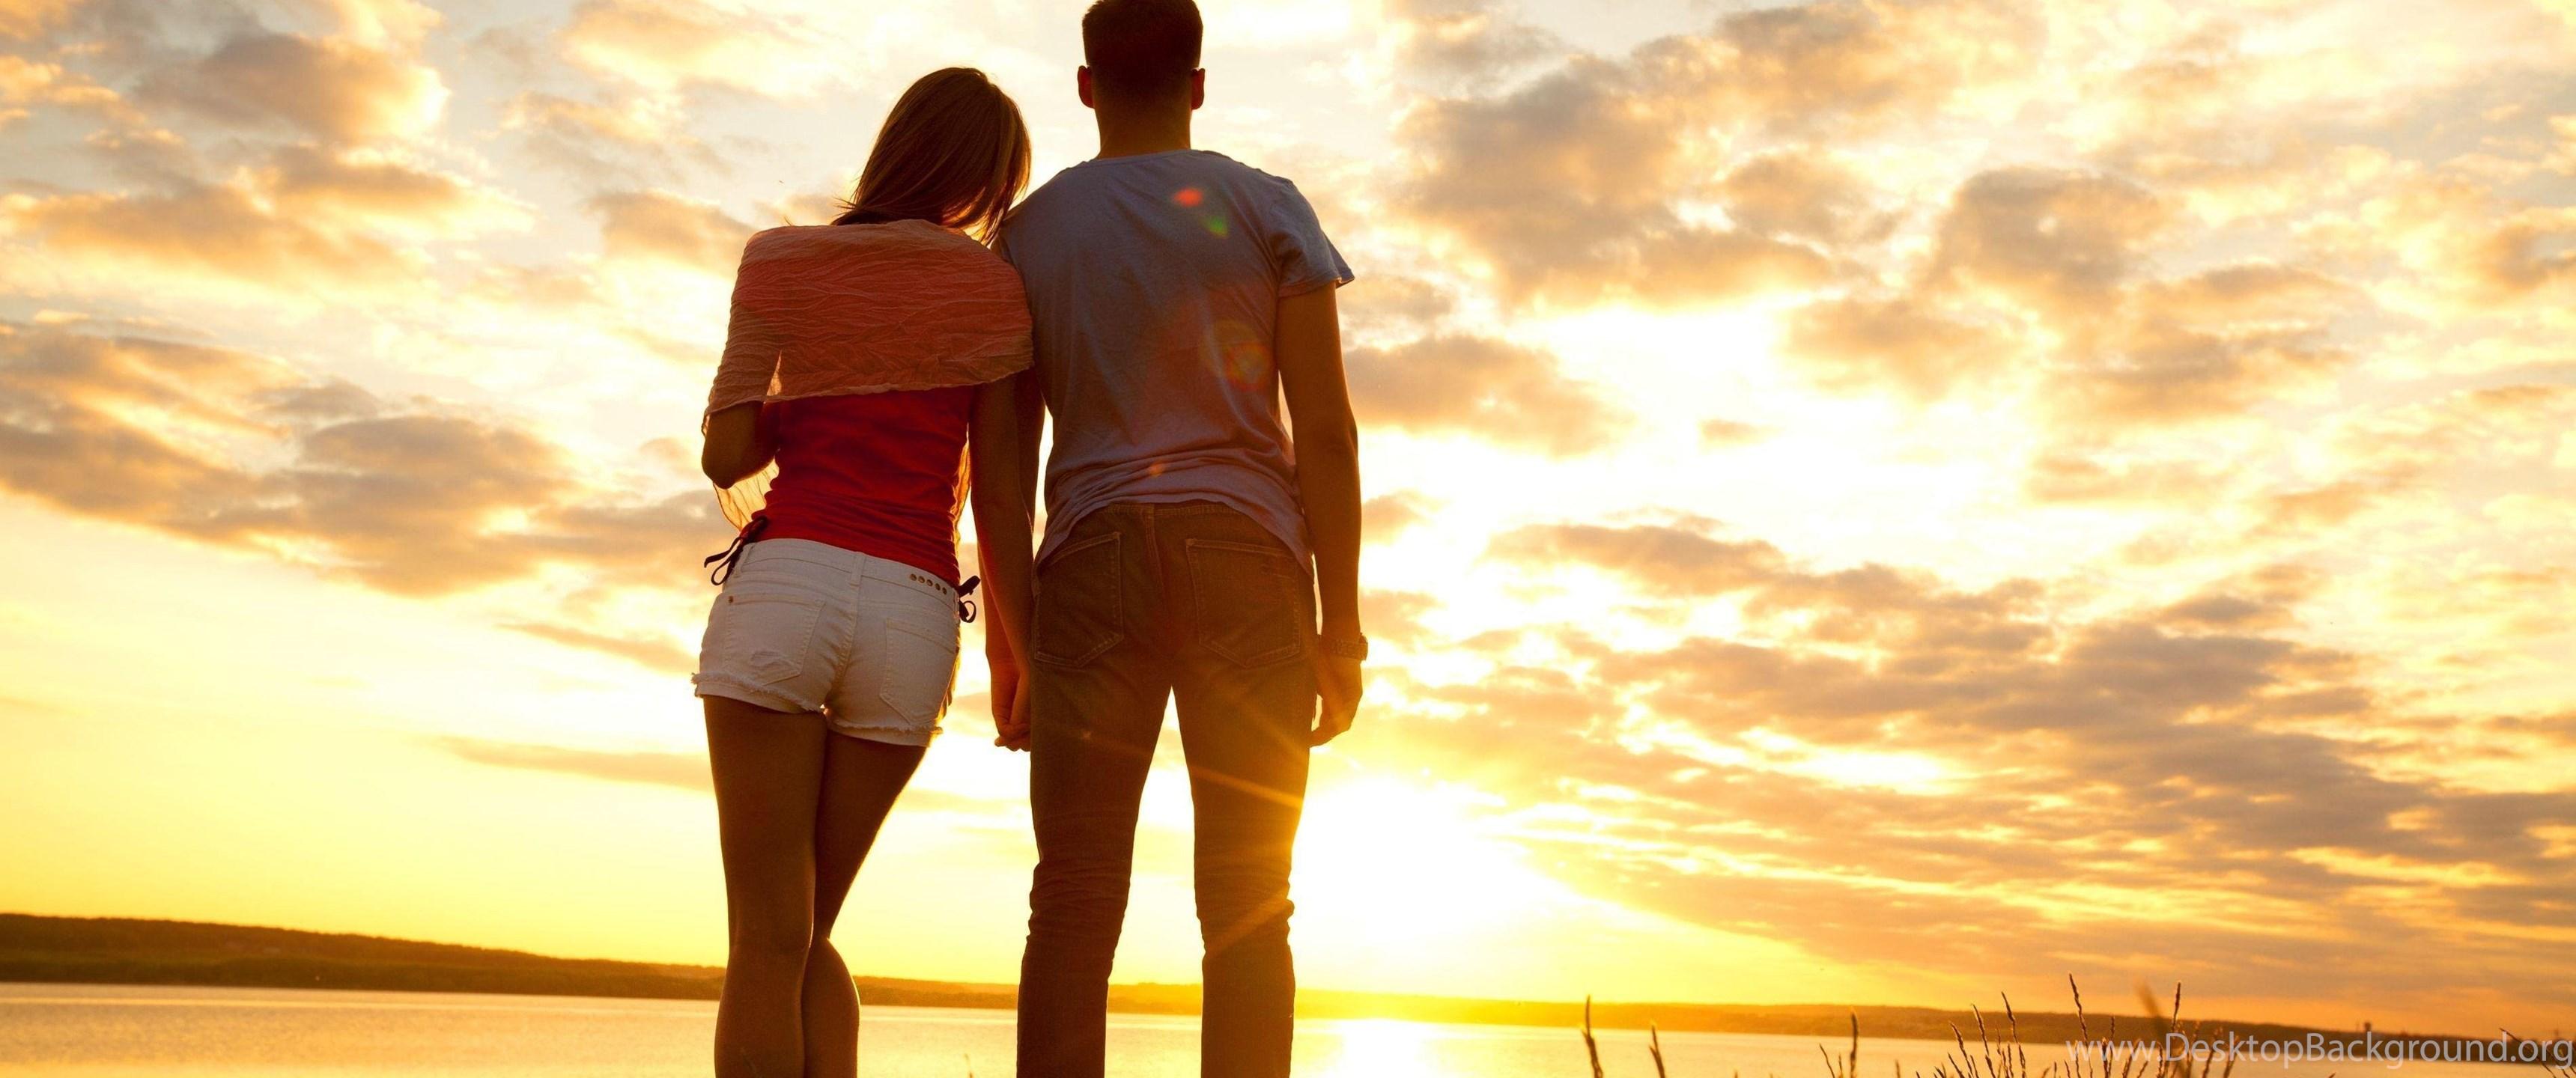 World Top Romantic Places Hd Wallpapers Desktop Background